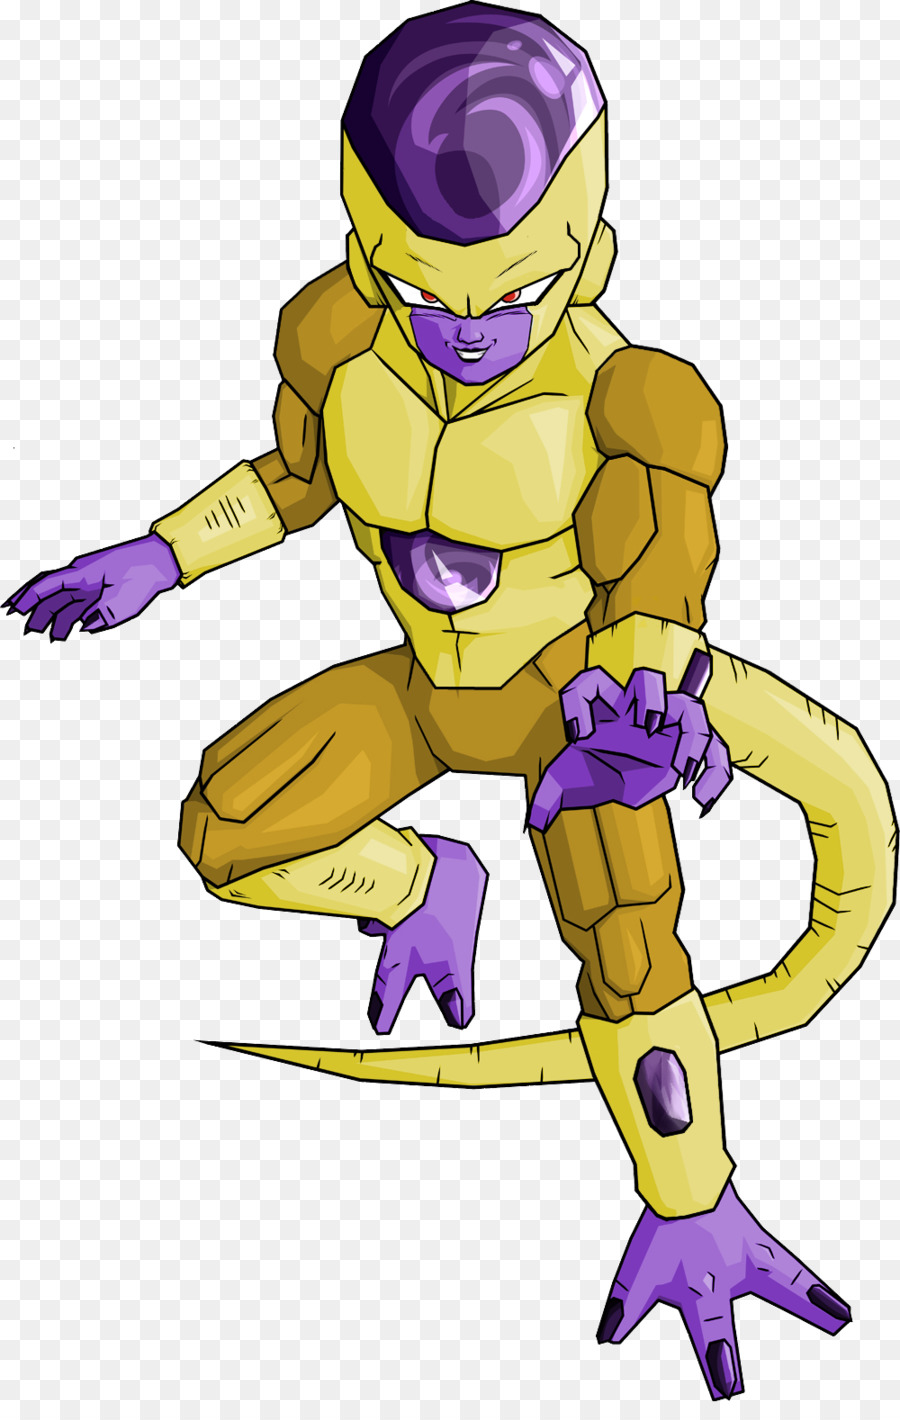 Frieza Cell Goku Majin Buu Dragon Ball Z Budokai Tenkaichi 3 Goku